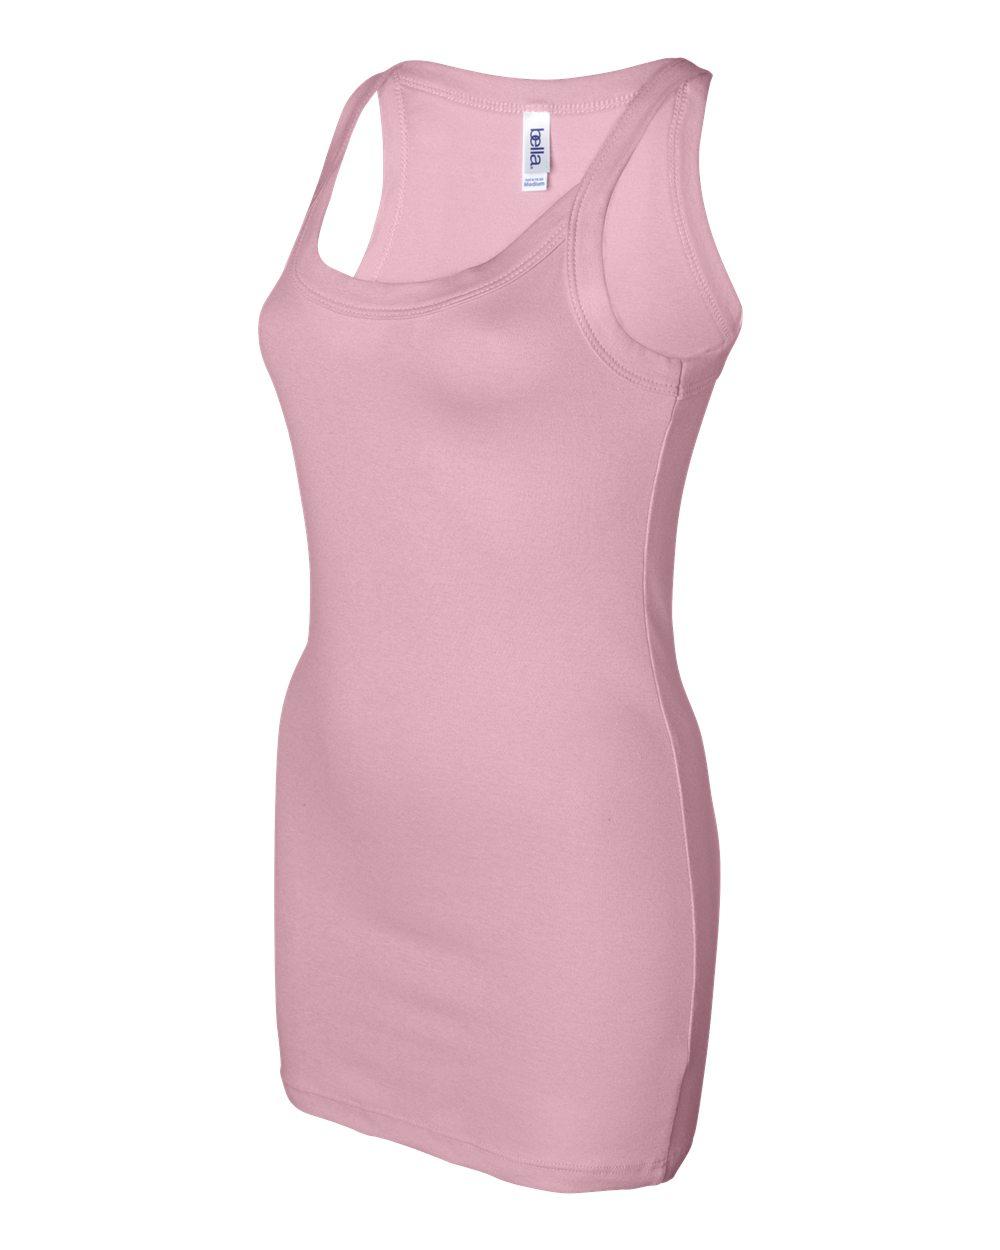 Bella 8711 Pink